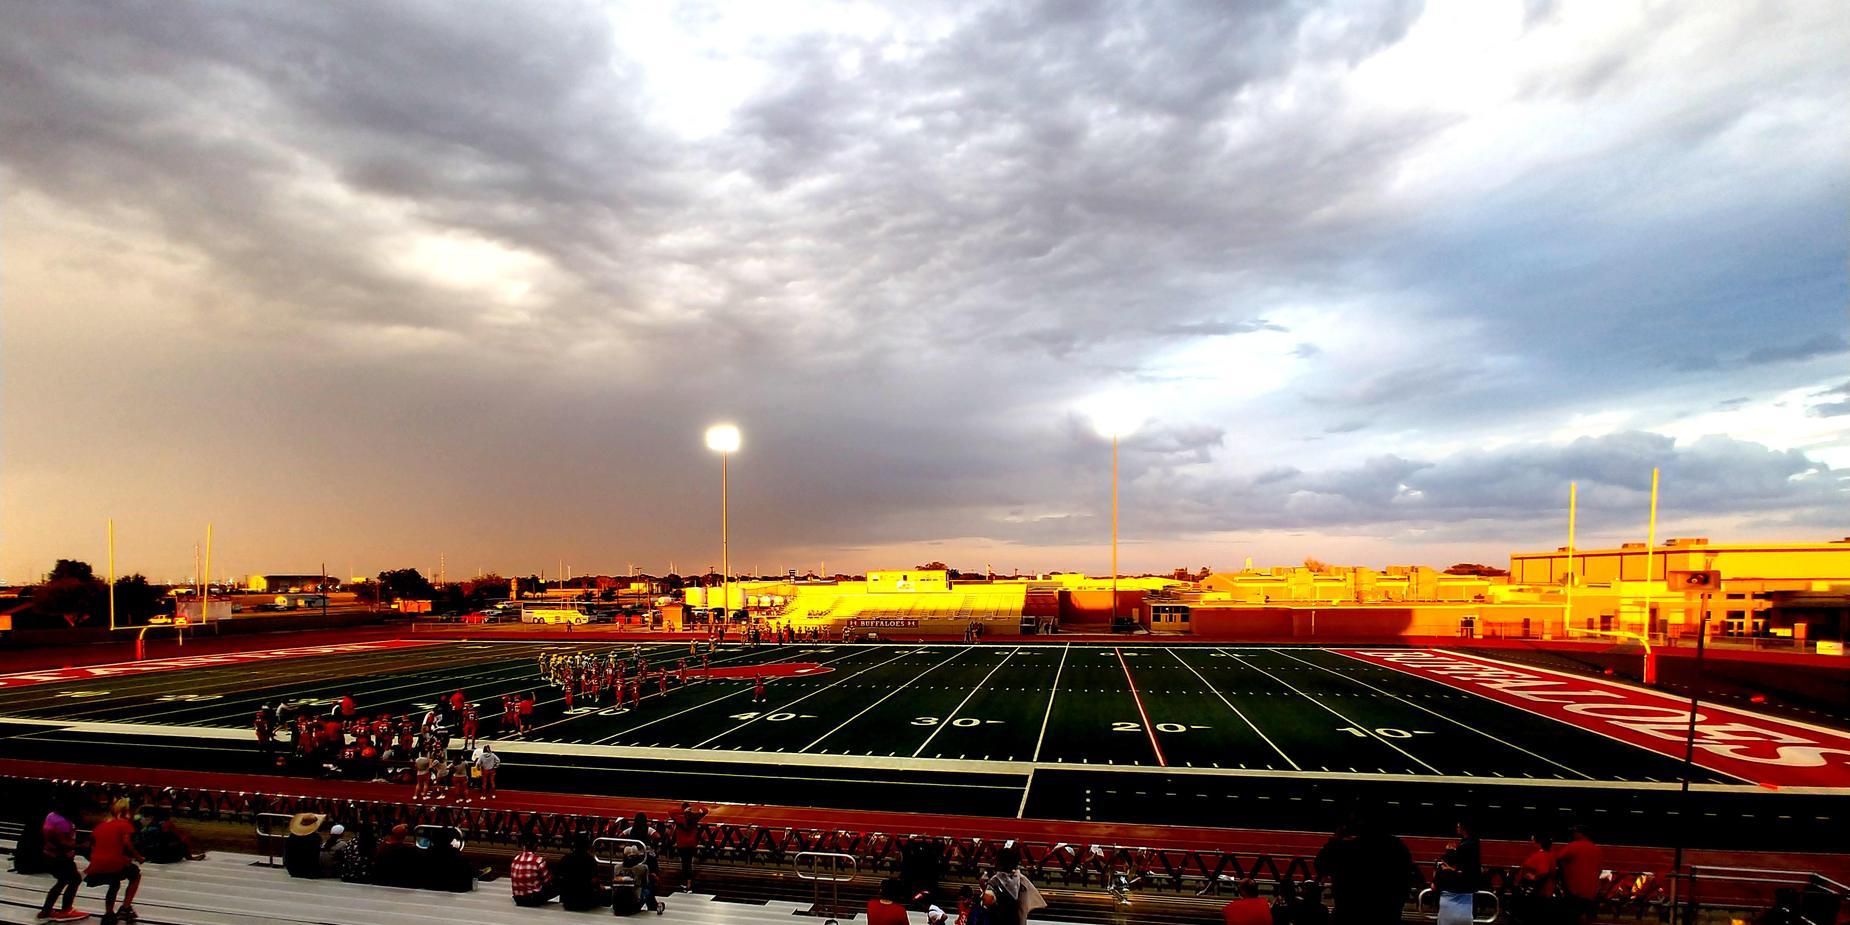 Stanton ISD football team takes the field